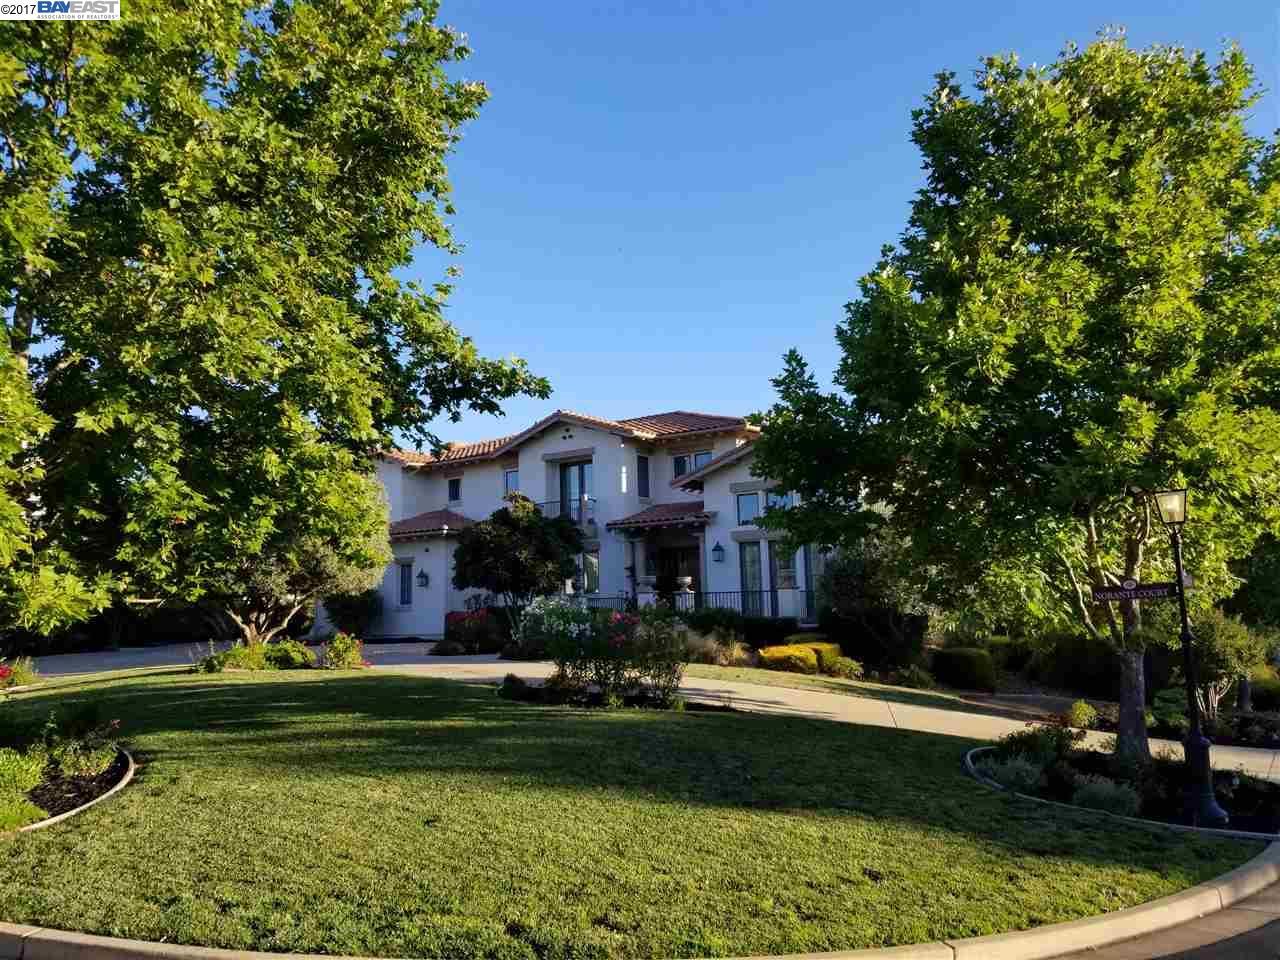 Single Family Home for Sale at 637 Norante Court 637 Norante Court Pleasanton, California 94566 United States